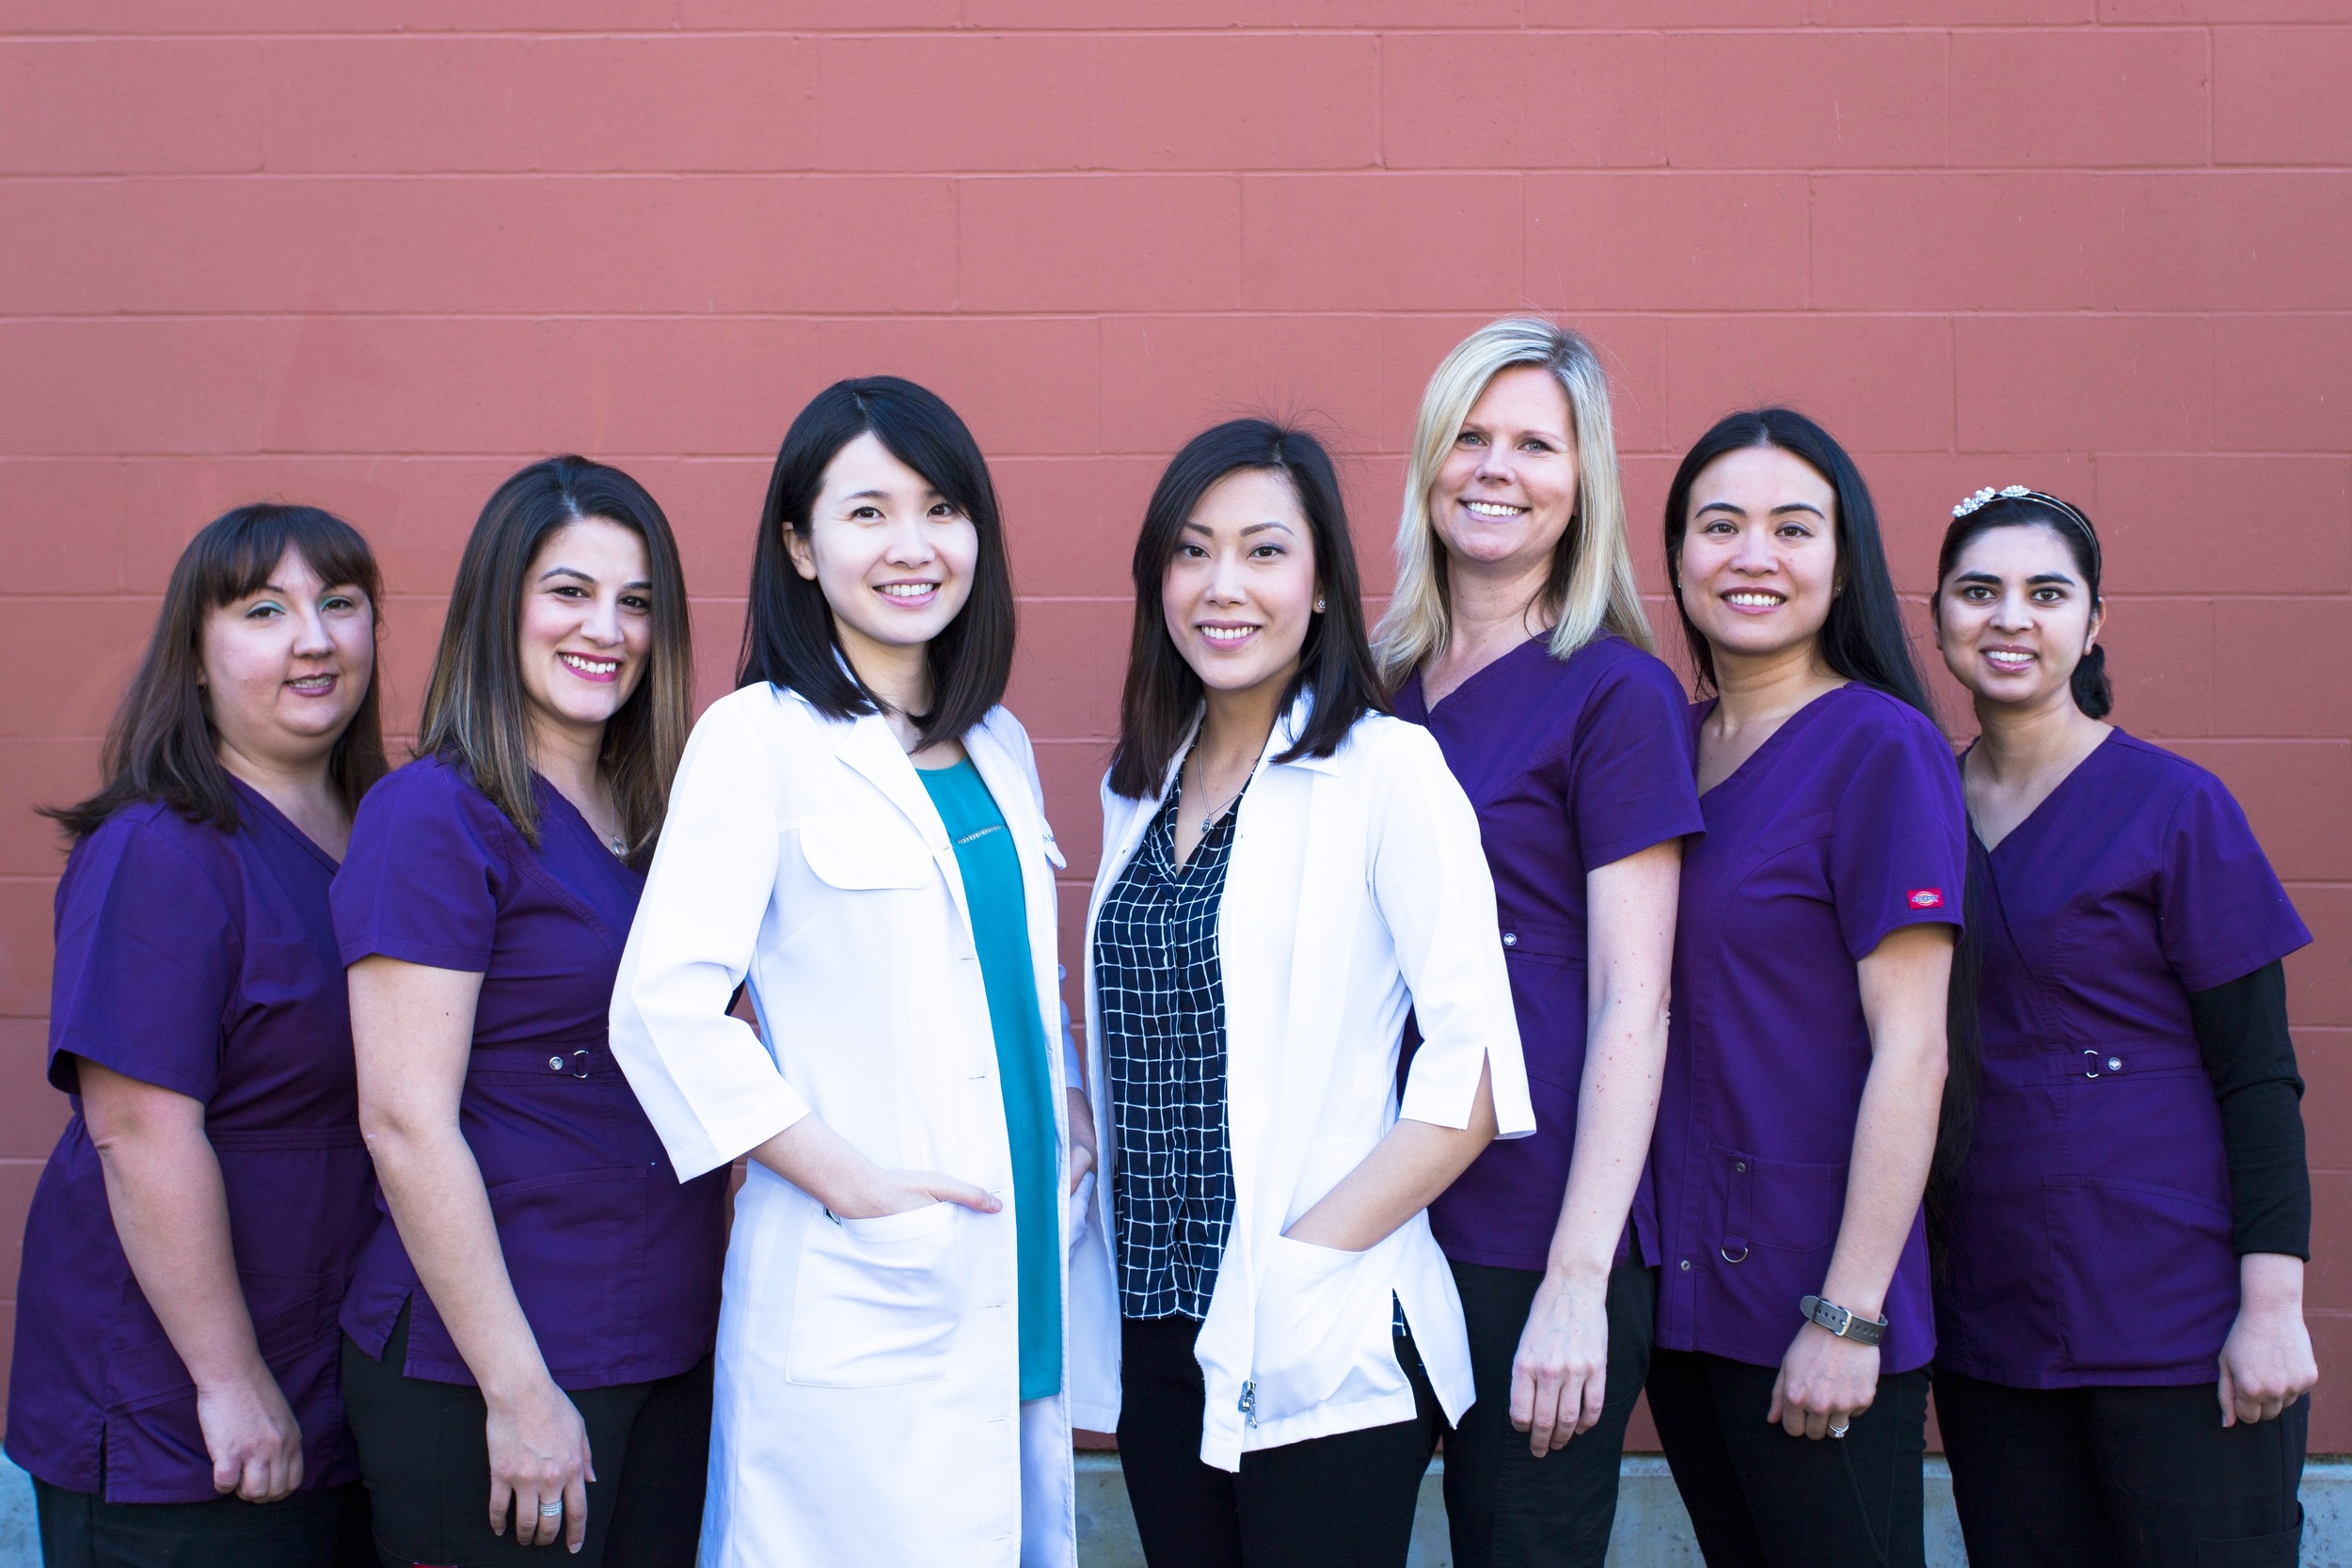 Just Smiles Dental Team